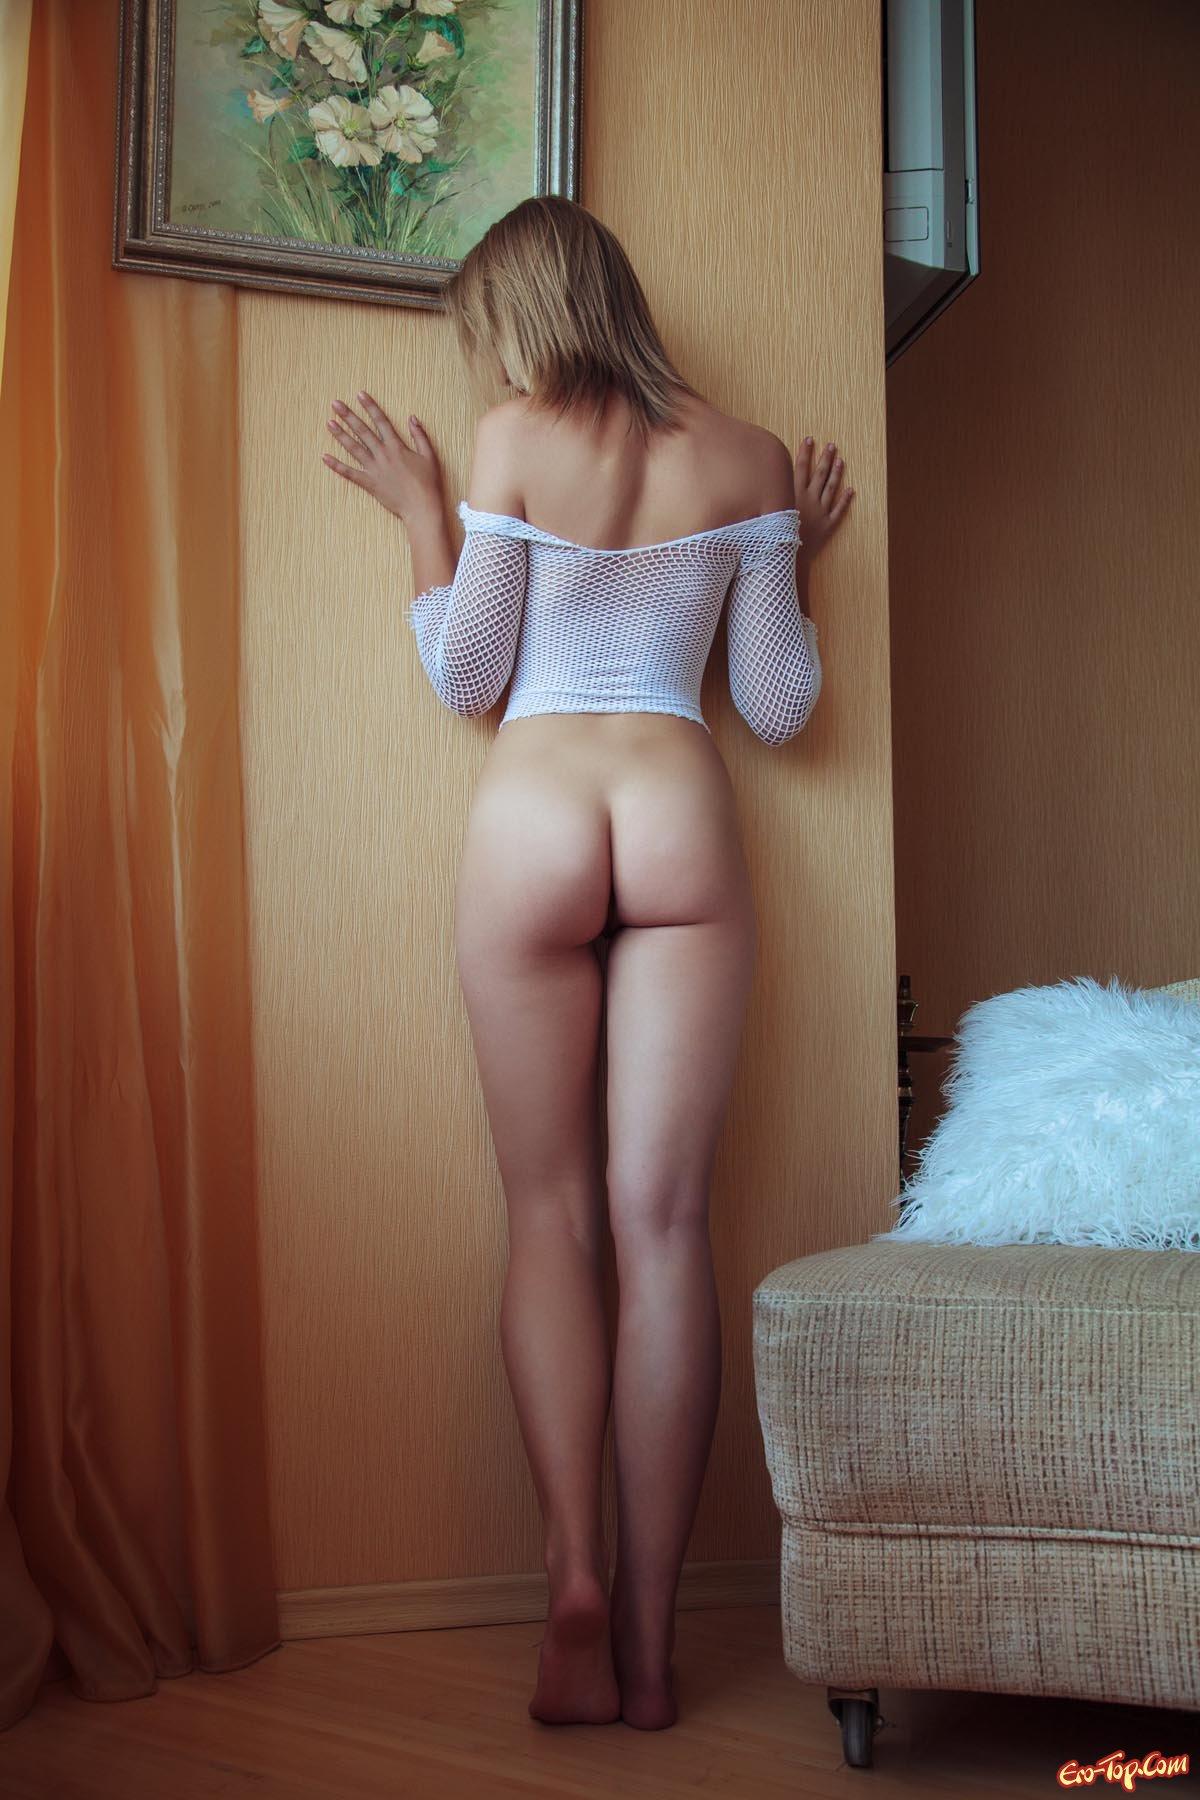 Юная красавица Rachel Blau секс фото